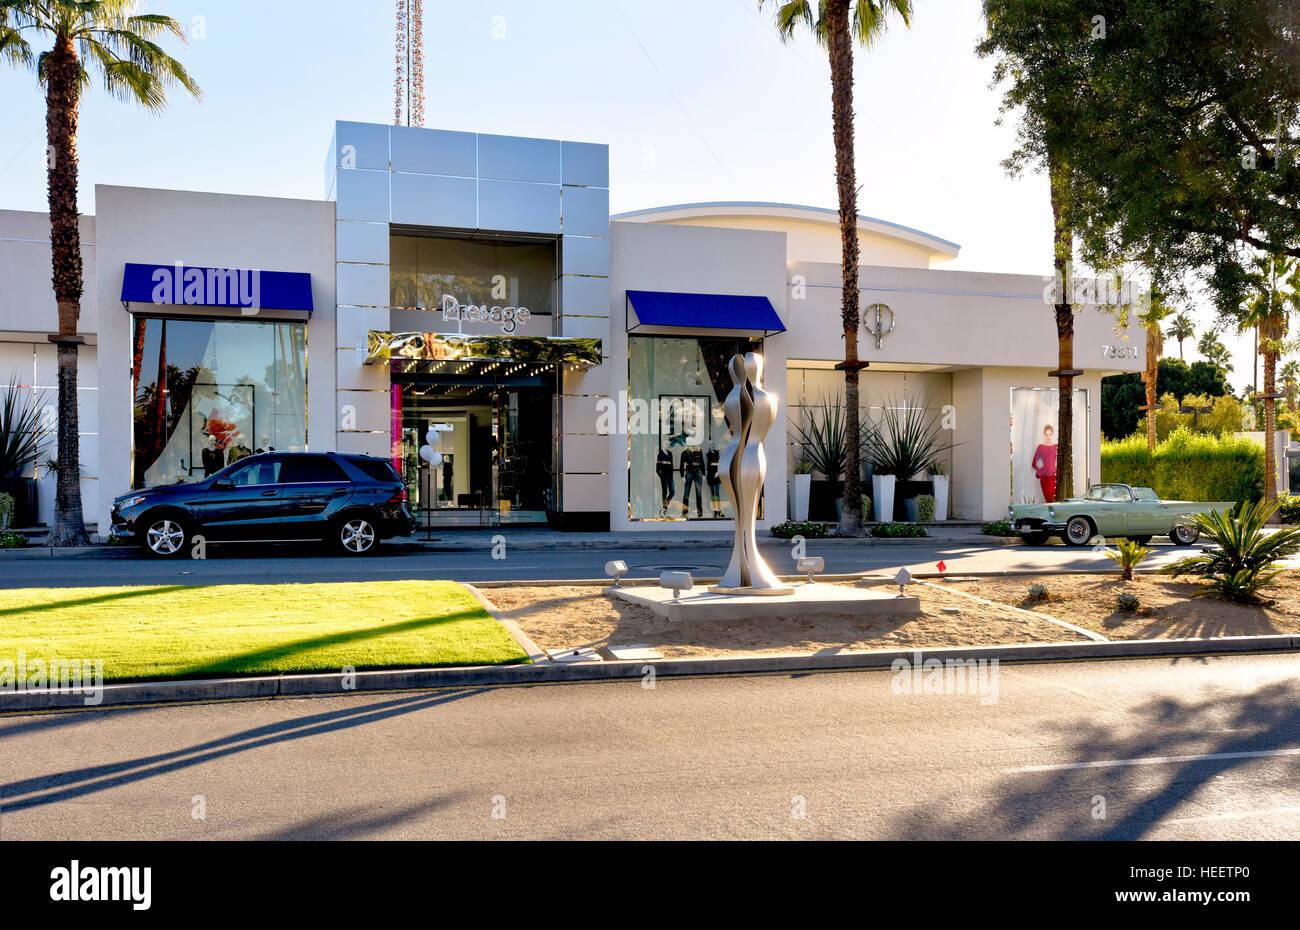 Prestige upscale shopping on El Paseo Drive - Stock Image